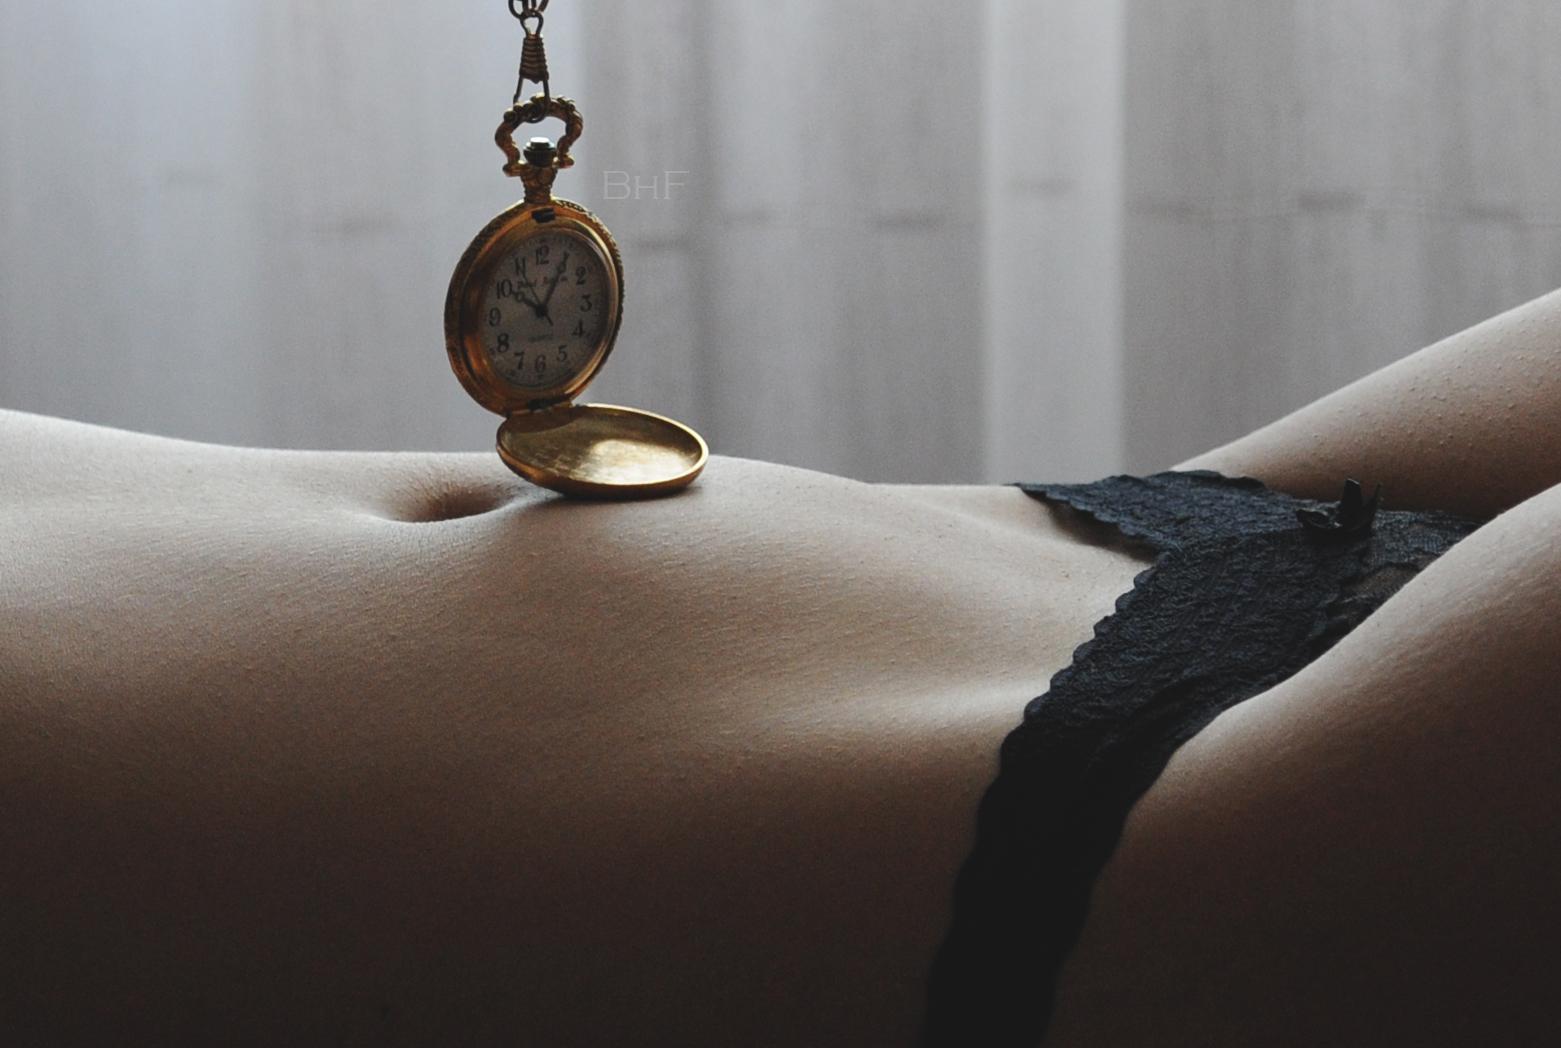 negro reloj metal desnudo niña mujer reloj Mujer Chica negro cuerpo cuello joyería Formas Desnudo Lenceria Cuerpo abdomen Ombligo Encaje Curvas Reloj ropa interior Semidesnudo